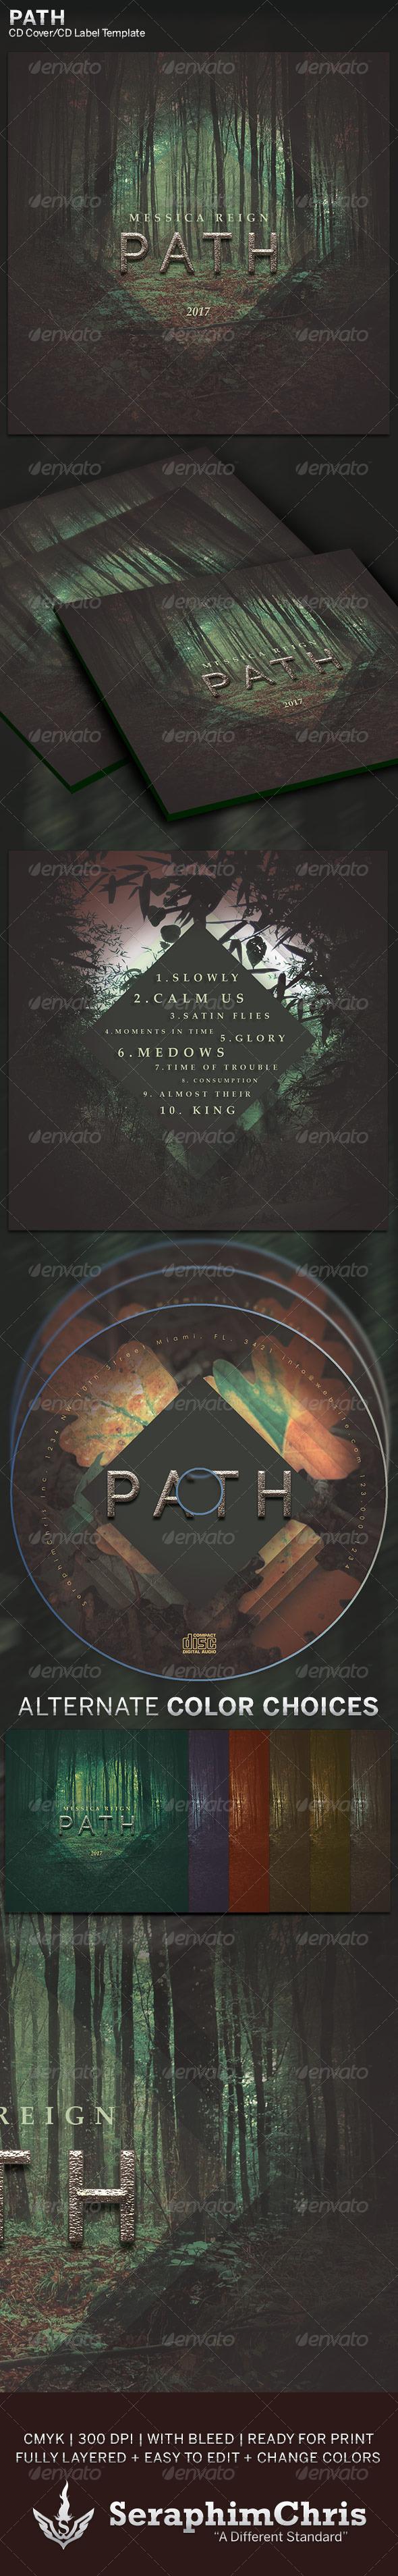 GraphicRiver Path CD Cover Artwork Template 6246320